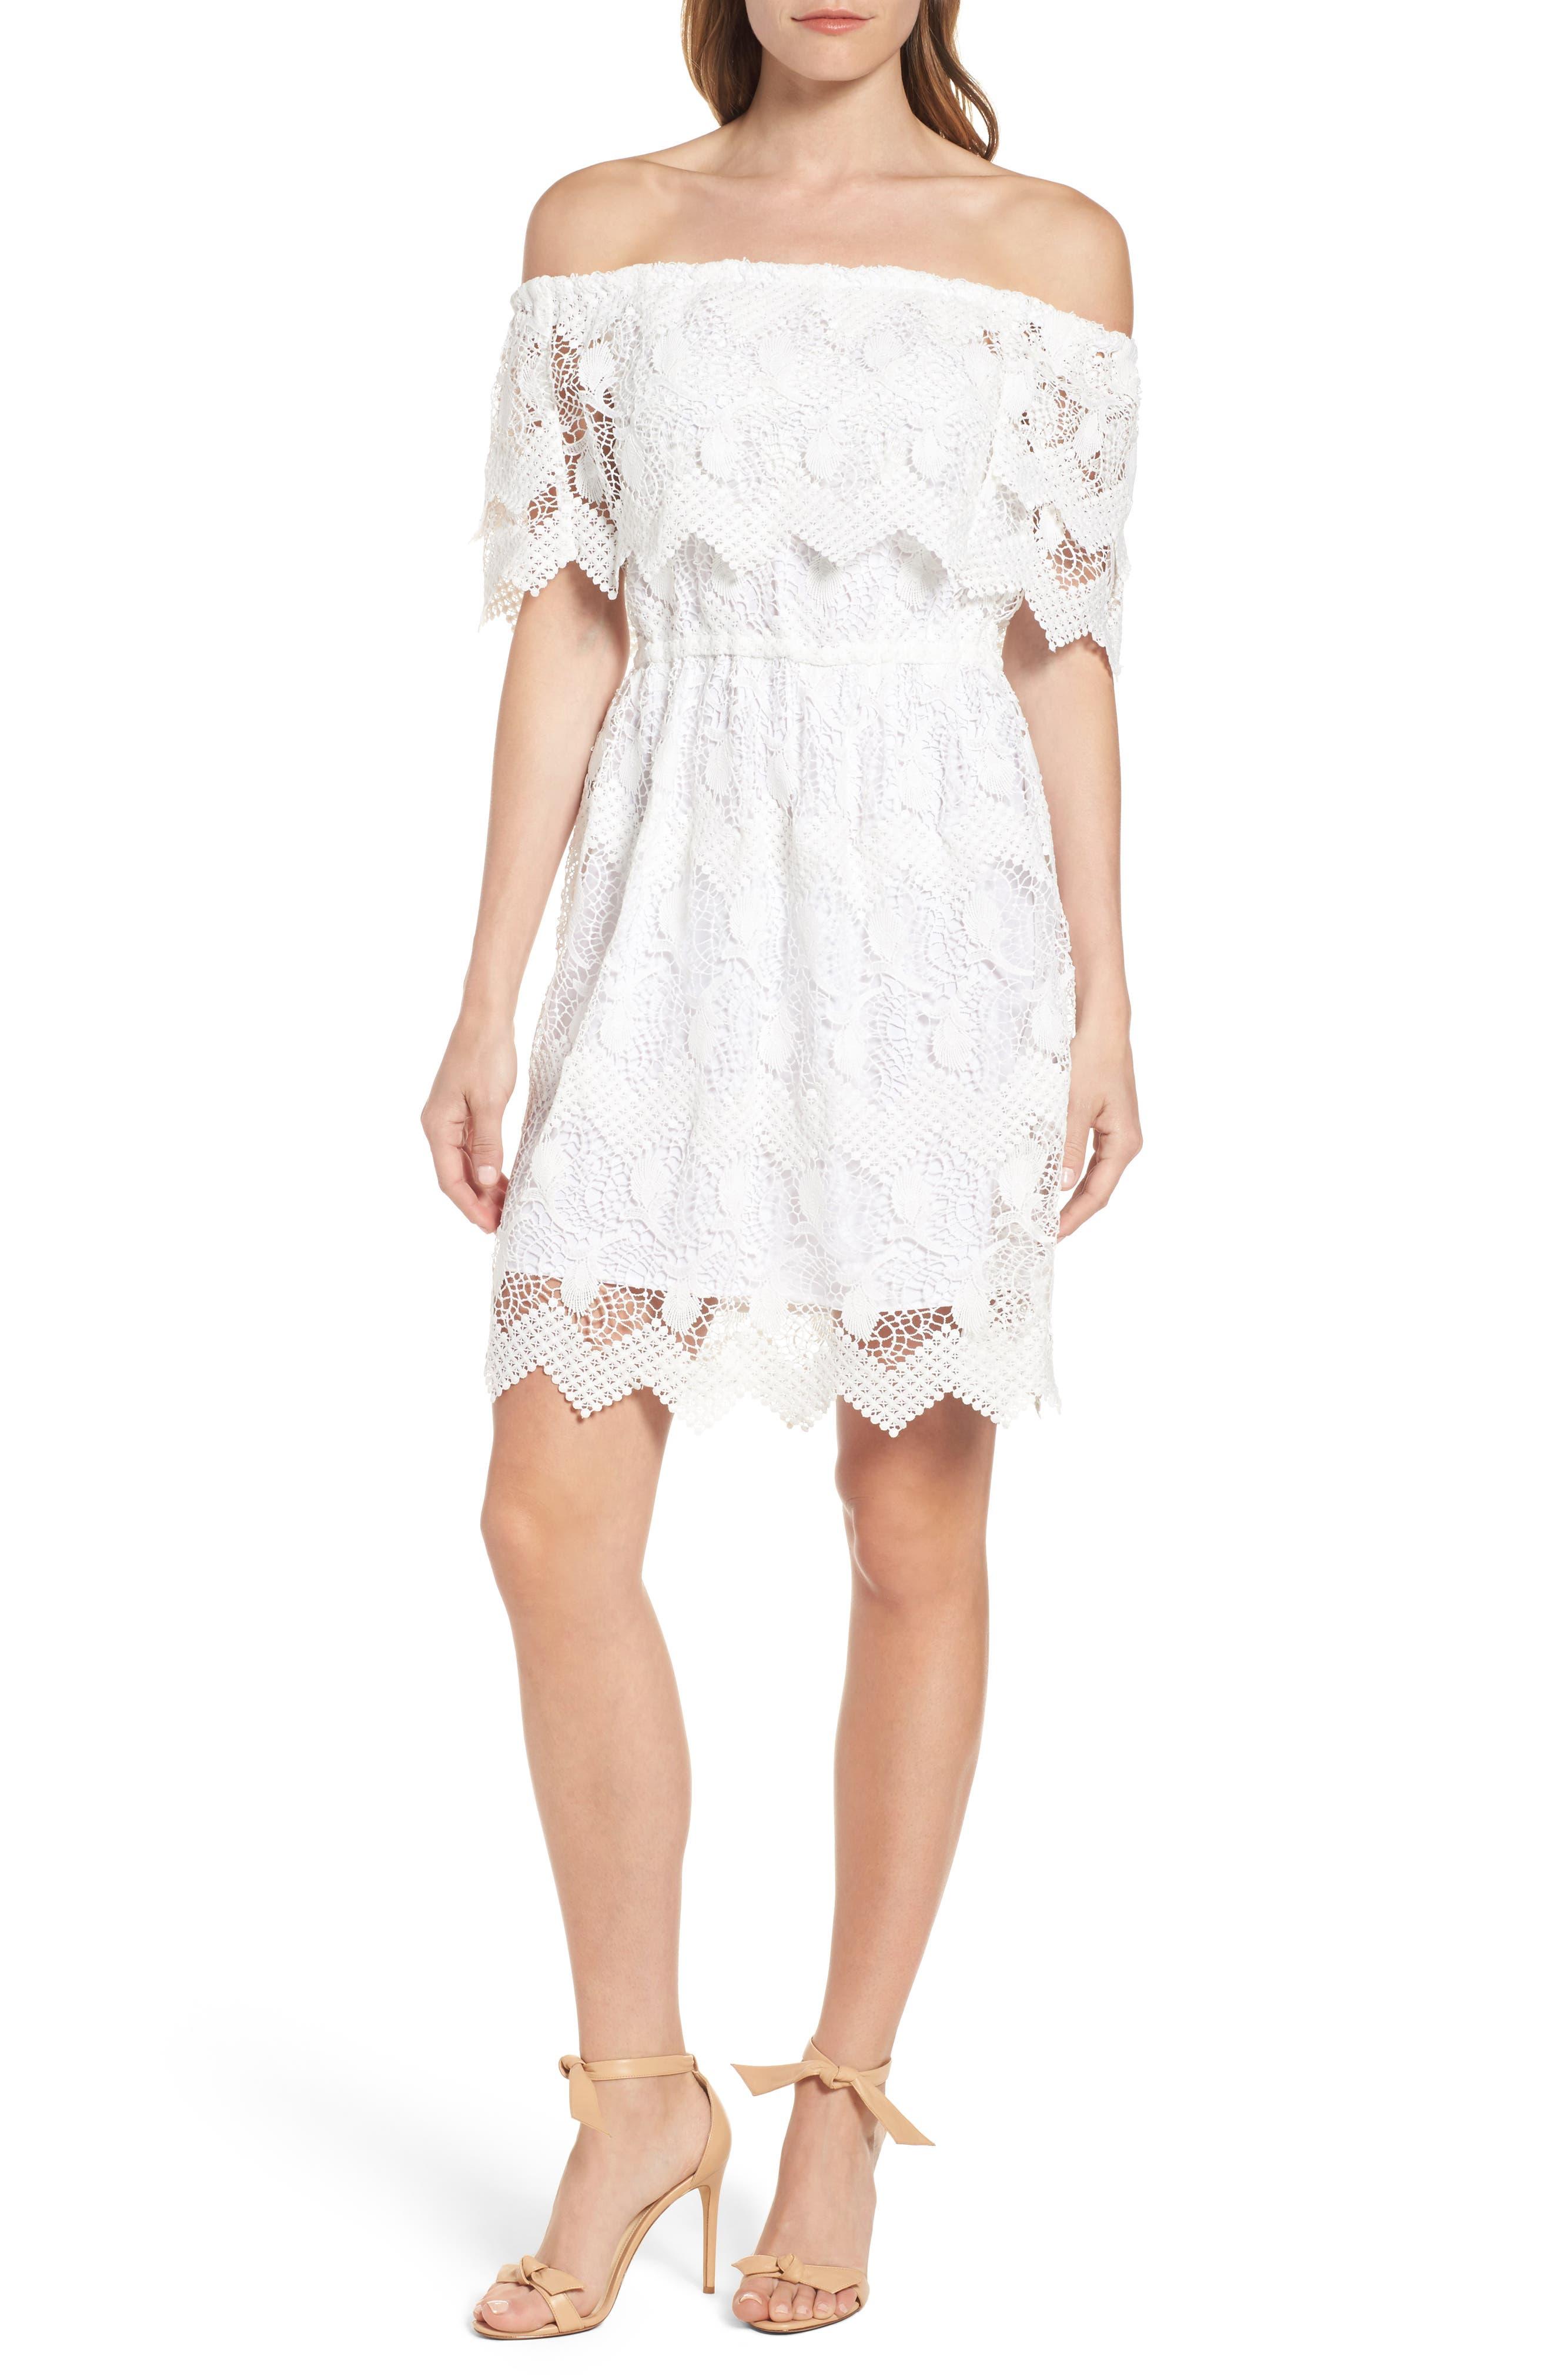 KOBI HALPERIN Alva Off the Shoulder Lace Dress